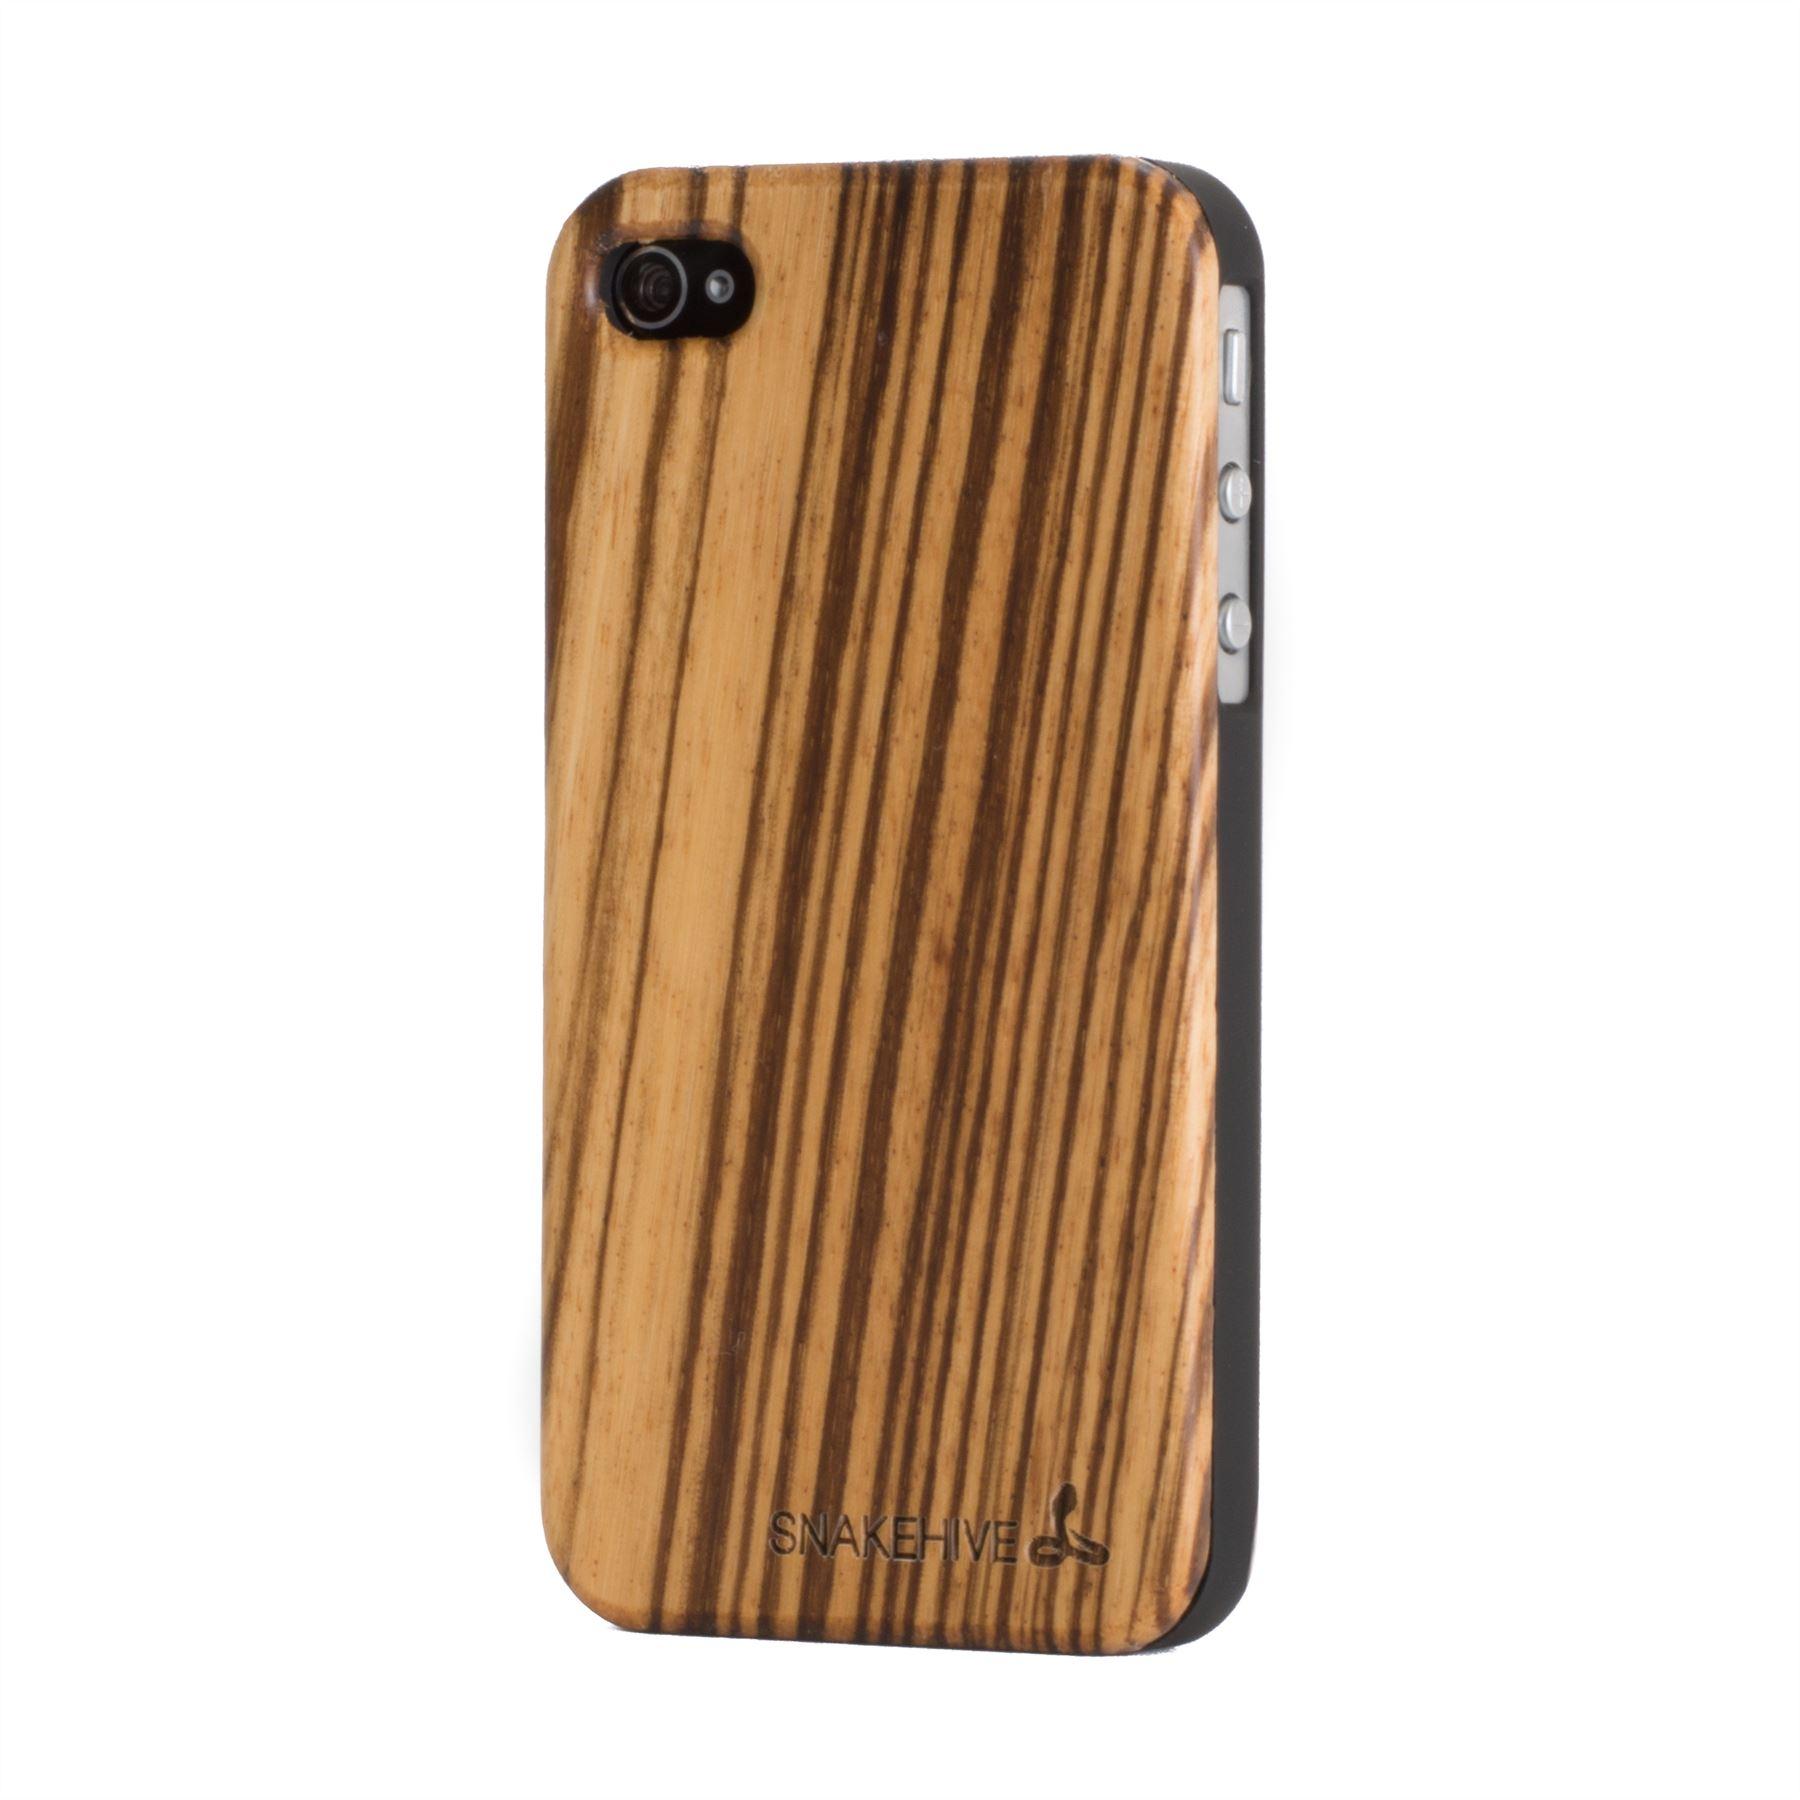 snakehive real wooden back case cover for apple iphone 4 4s natural wood ebay. Black Bedroom Furniture Sets. Home Design Ideas